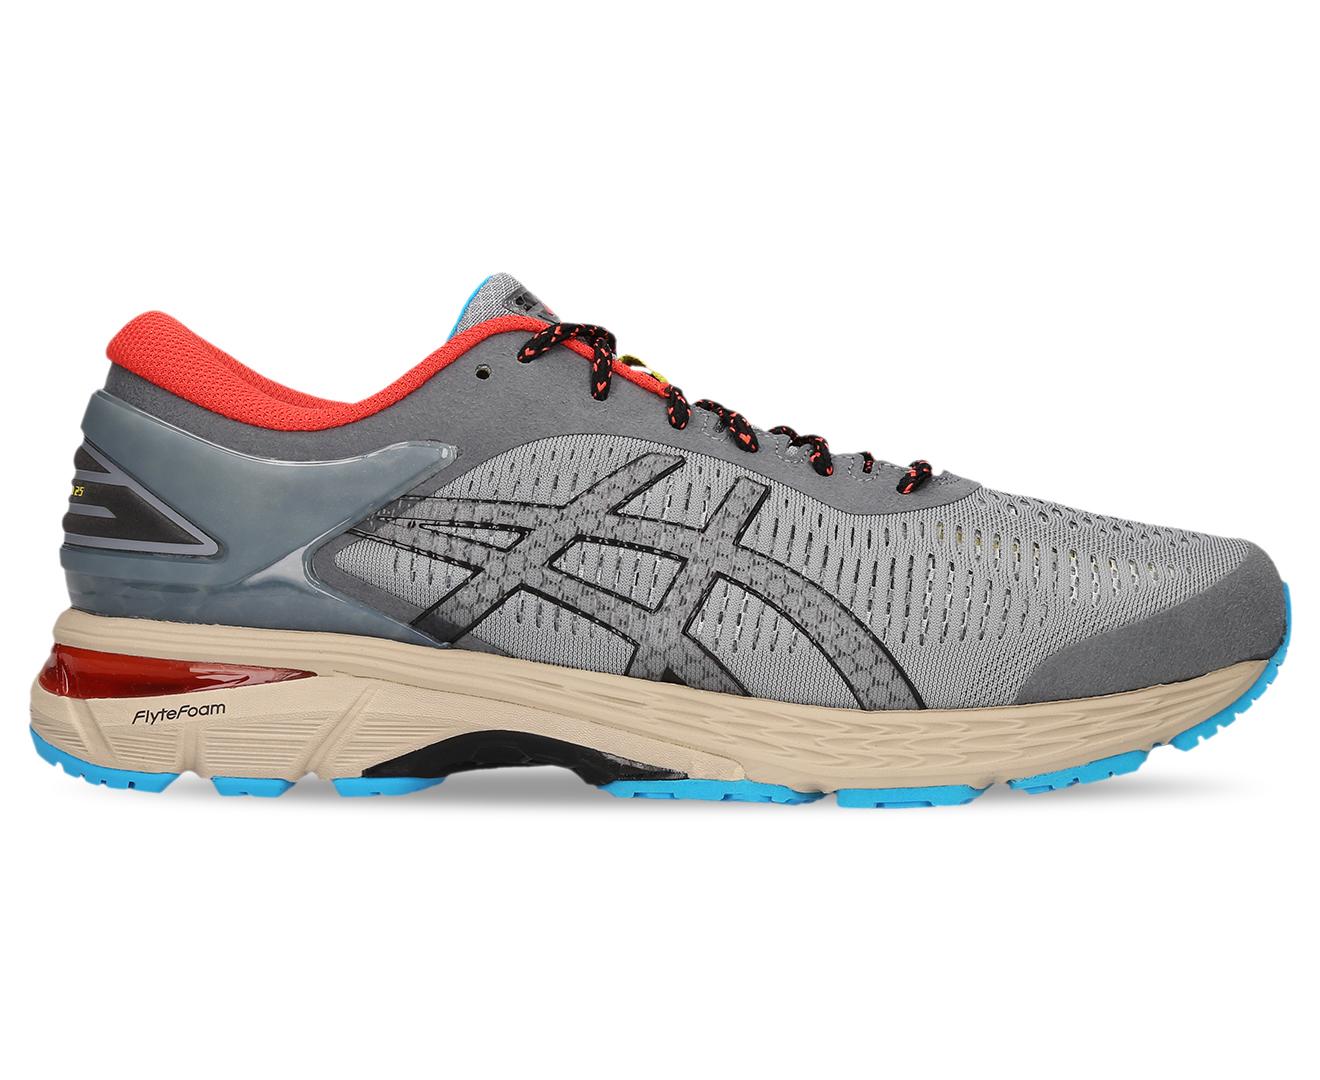 Details about ASICS Men's GEL Kayano 25 Shoe Stone GreyBlack